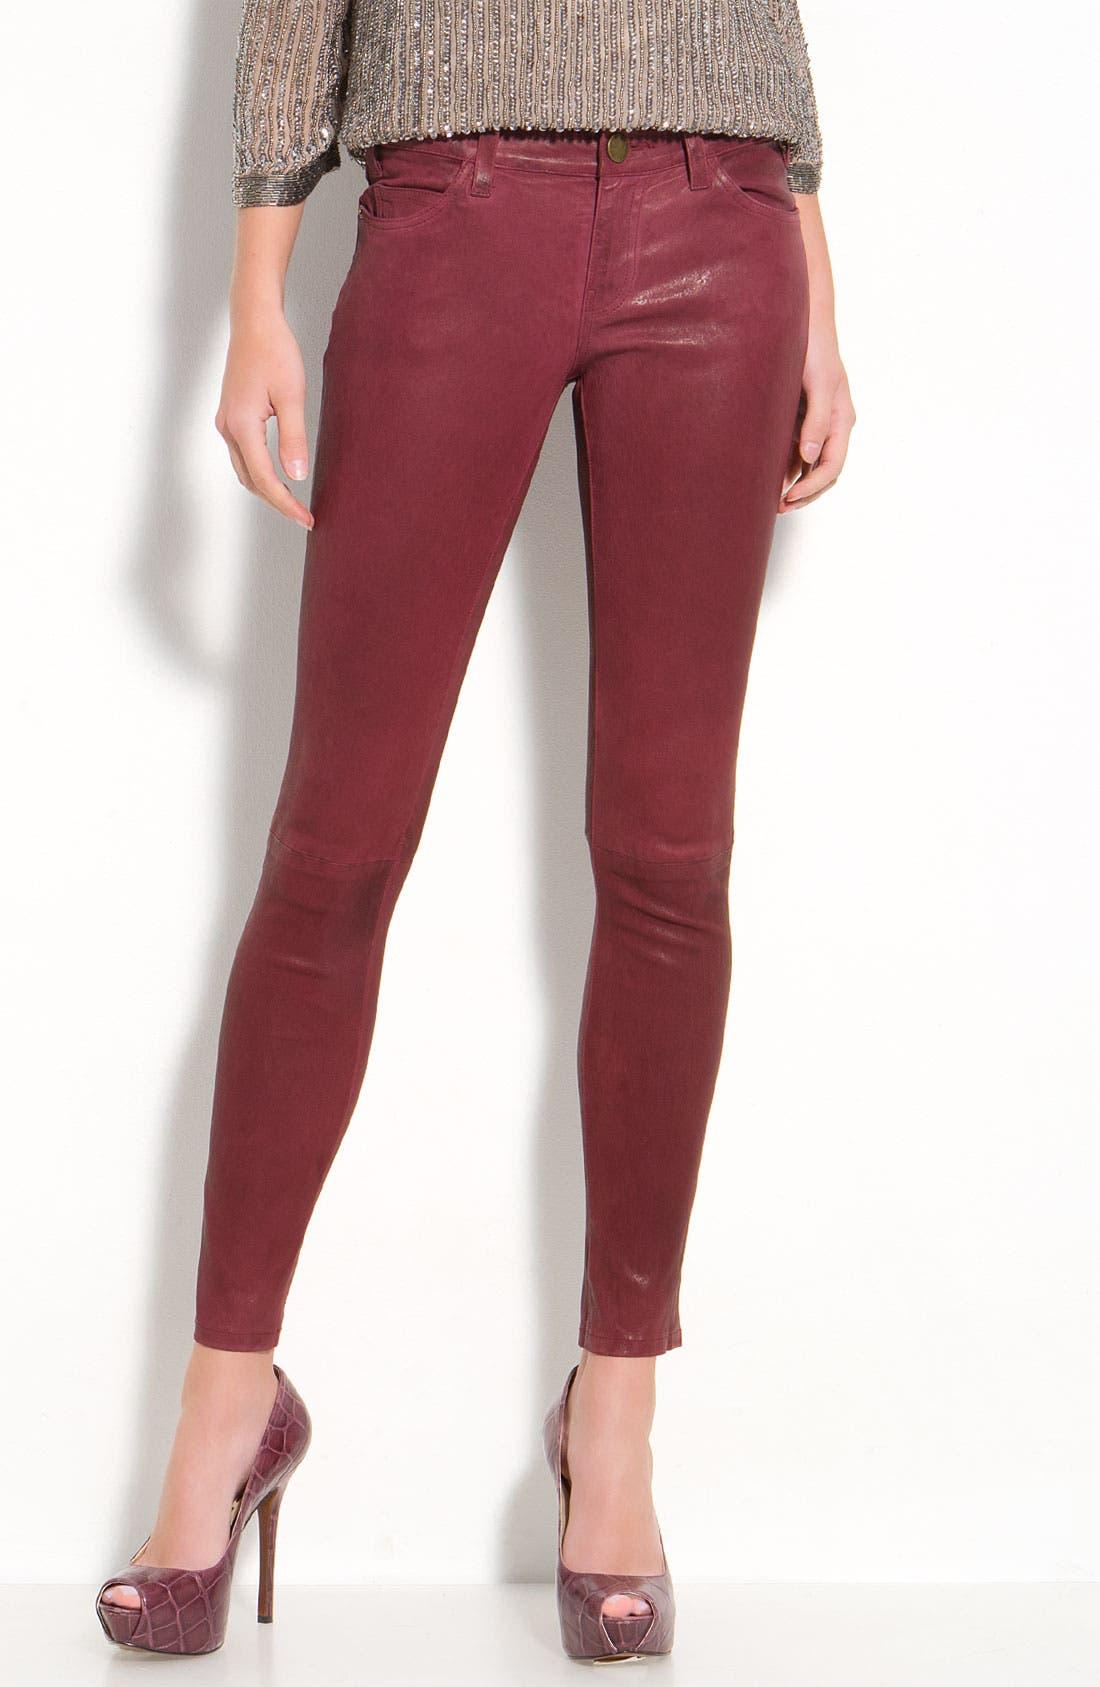 Alternate Image 1 Selected - Current/Elliott Leather Skinny Ankle Pants